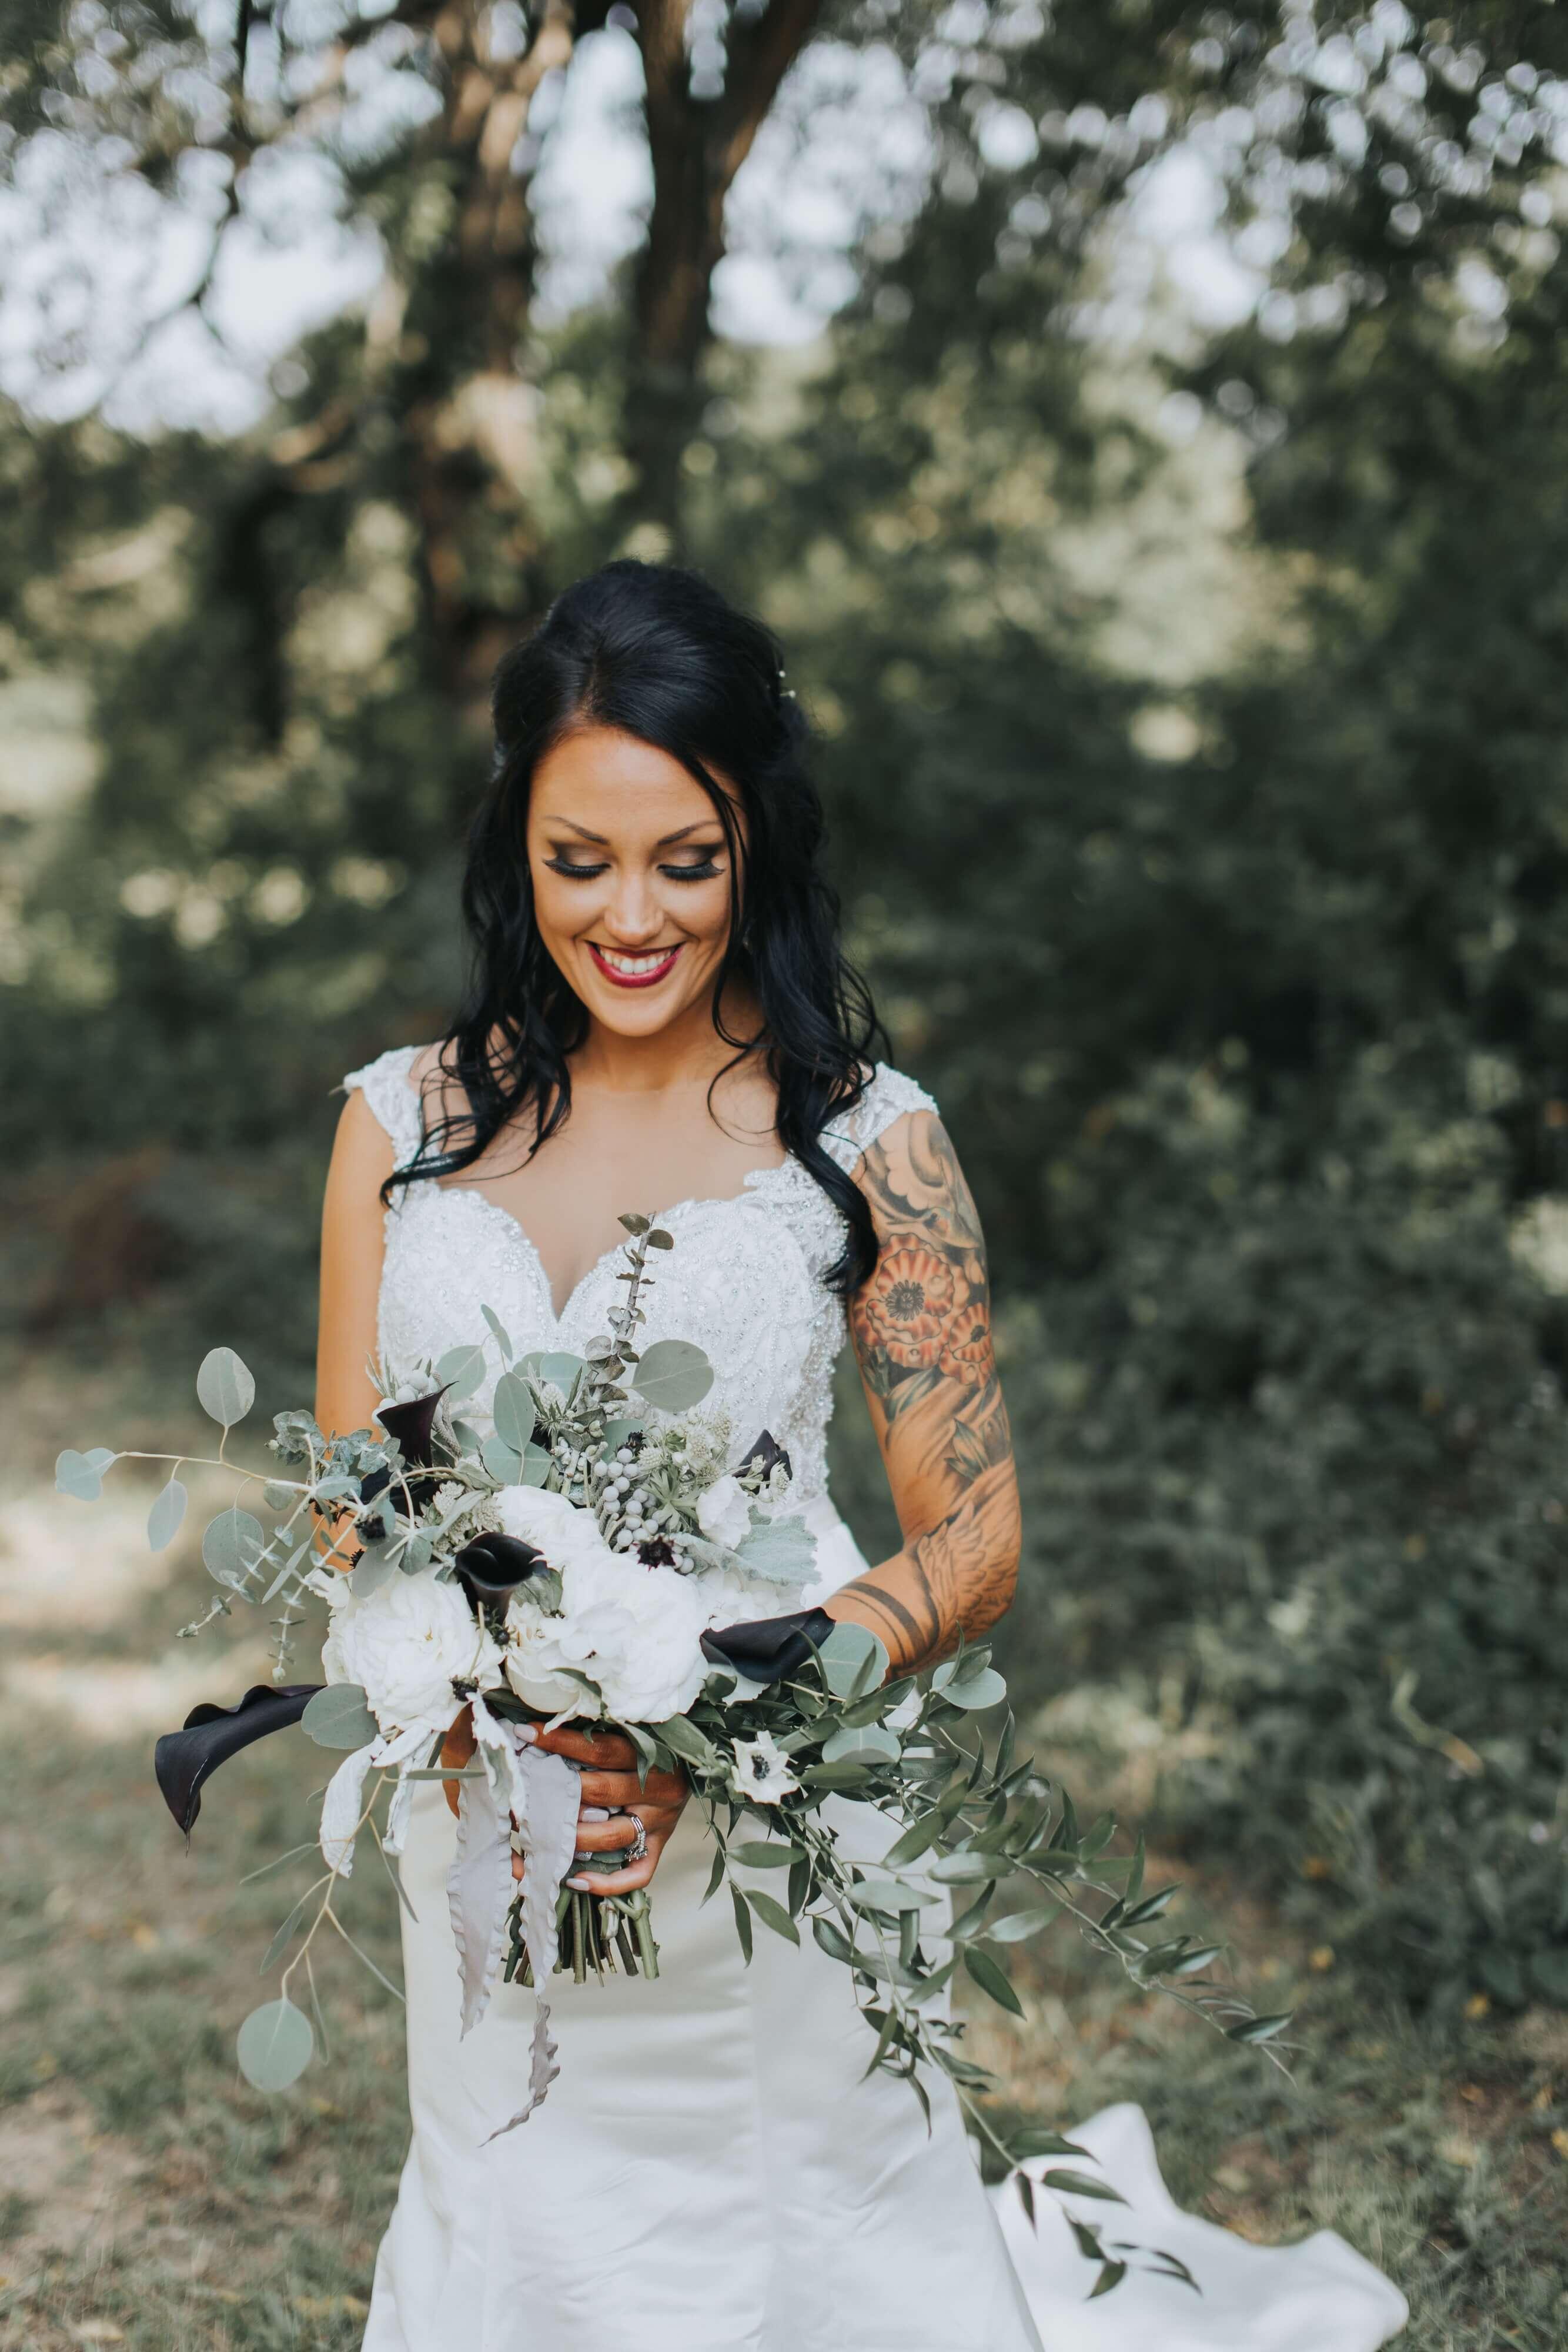 newborn photography okc - okc photography - wedding photography okc